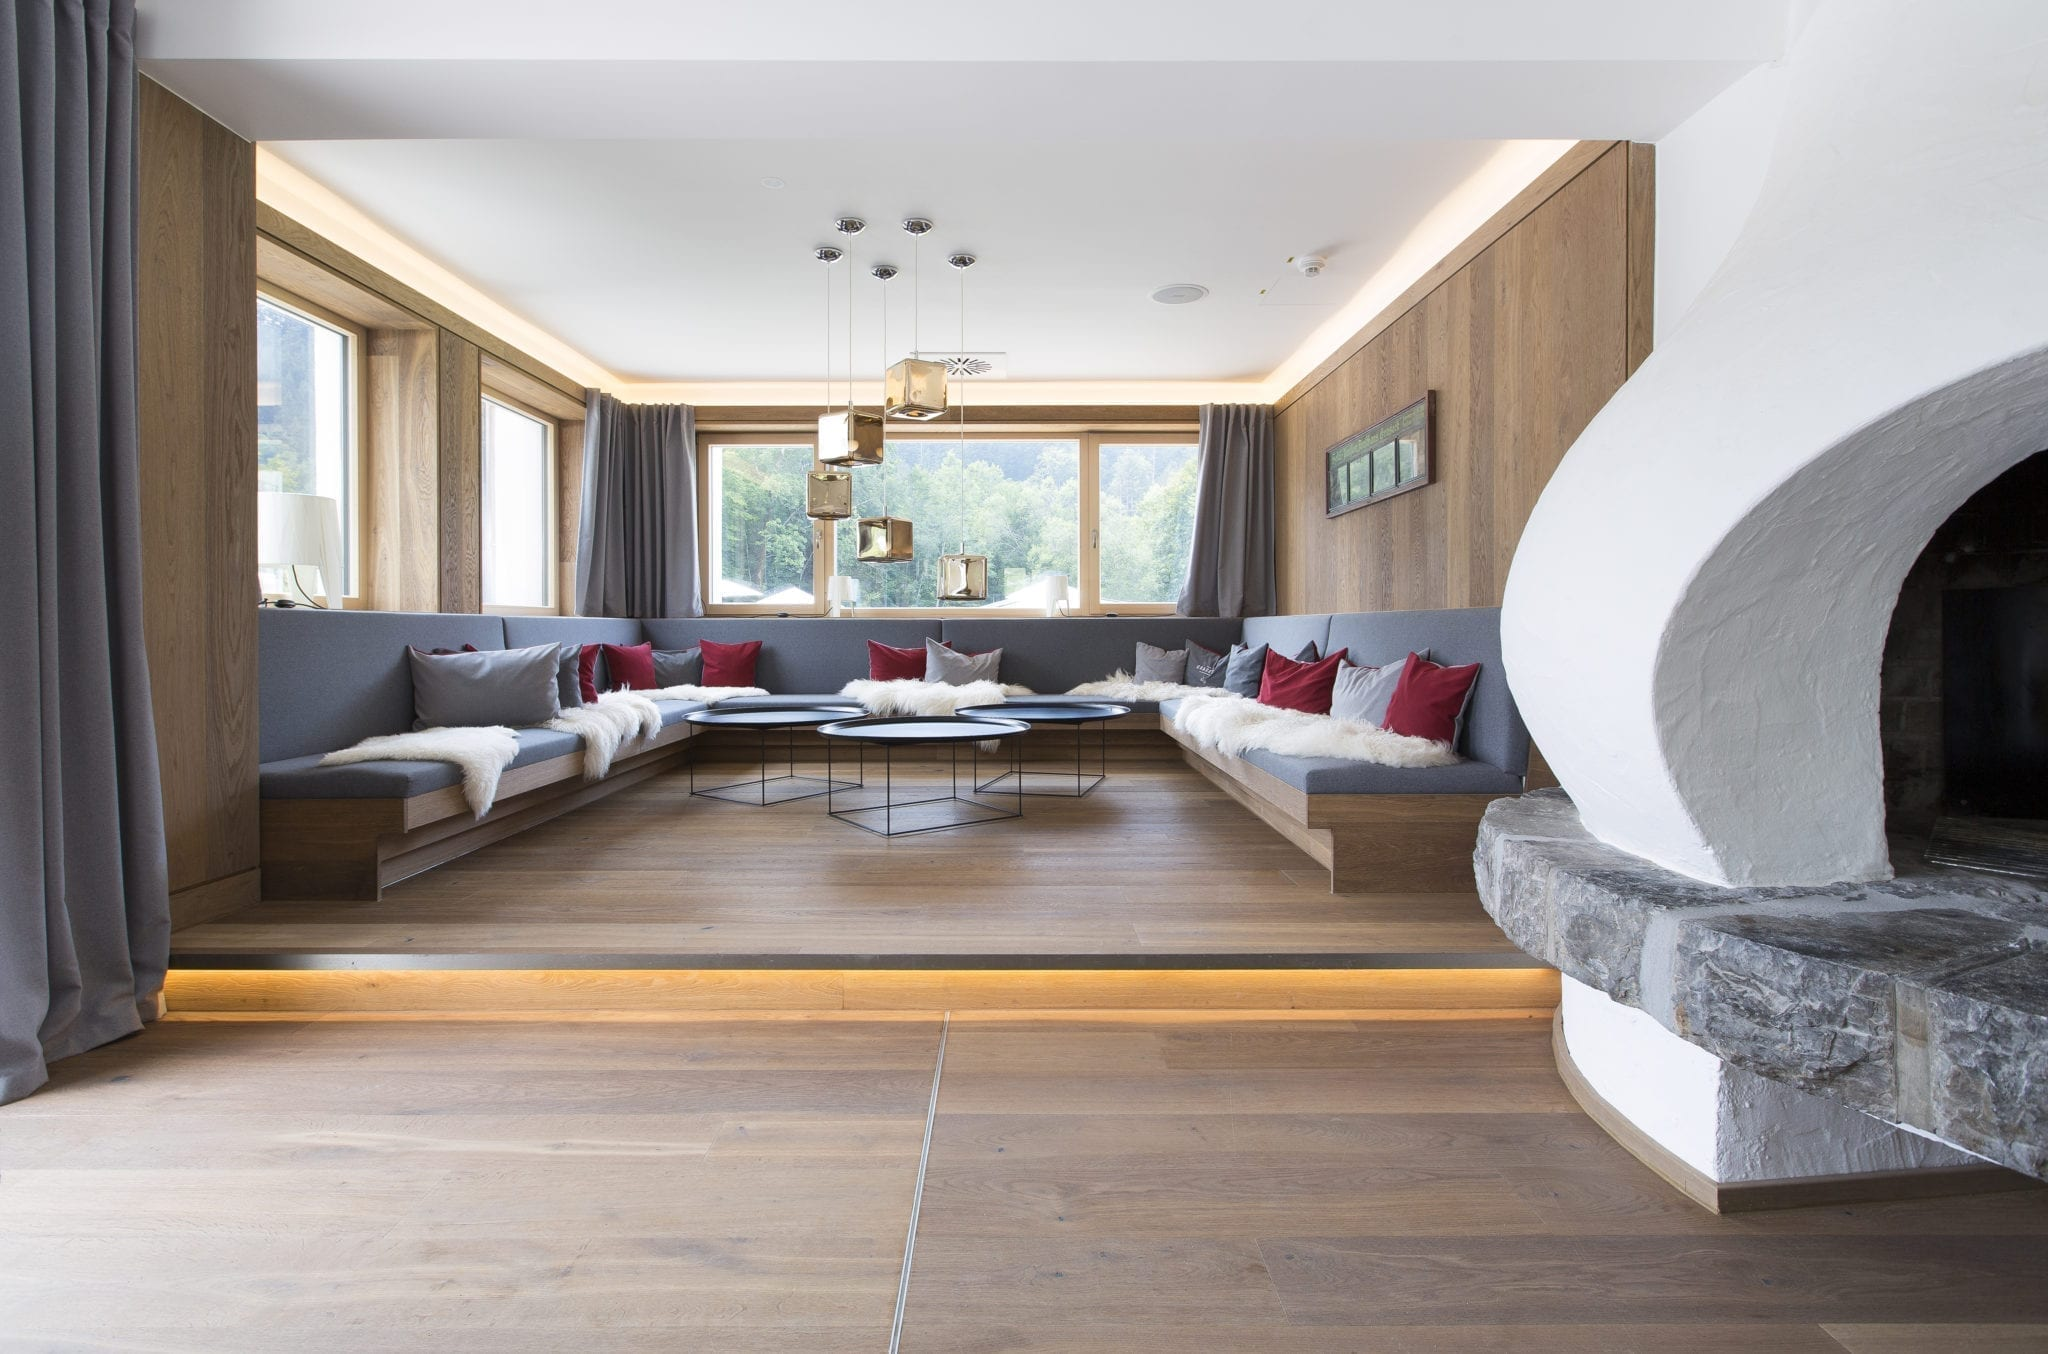 Hotel Graseck ELEMENTs DOORs FLOORs Eiche Lapis 41 scaled